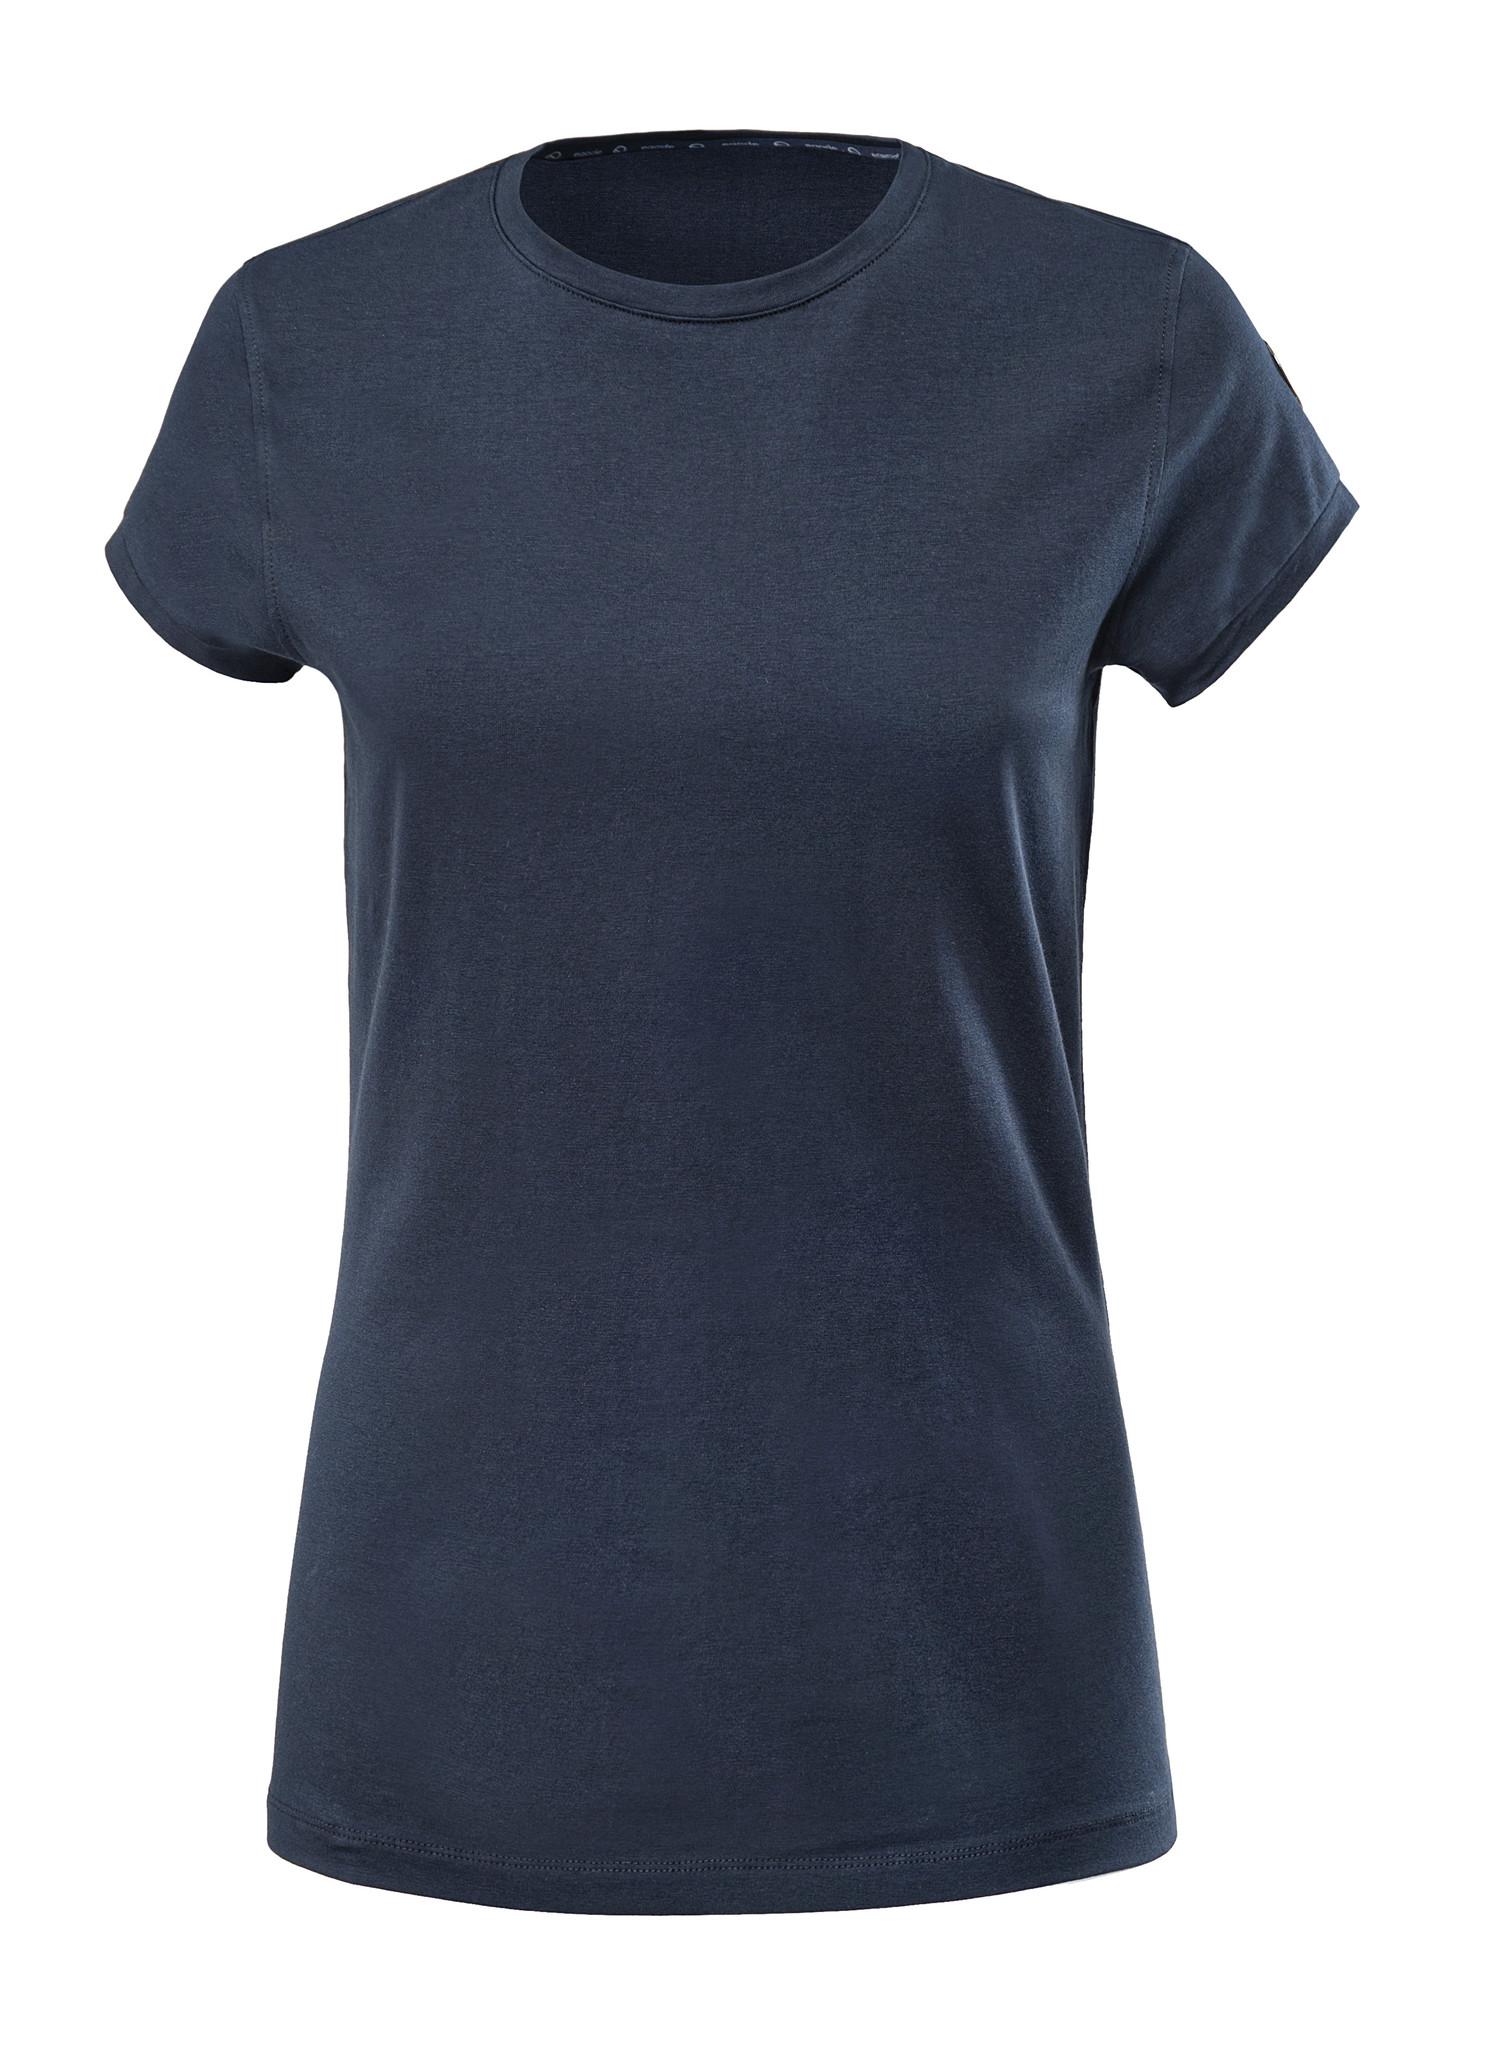 EQUILINE EQODE women's t-shirt